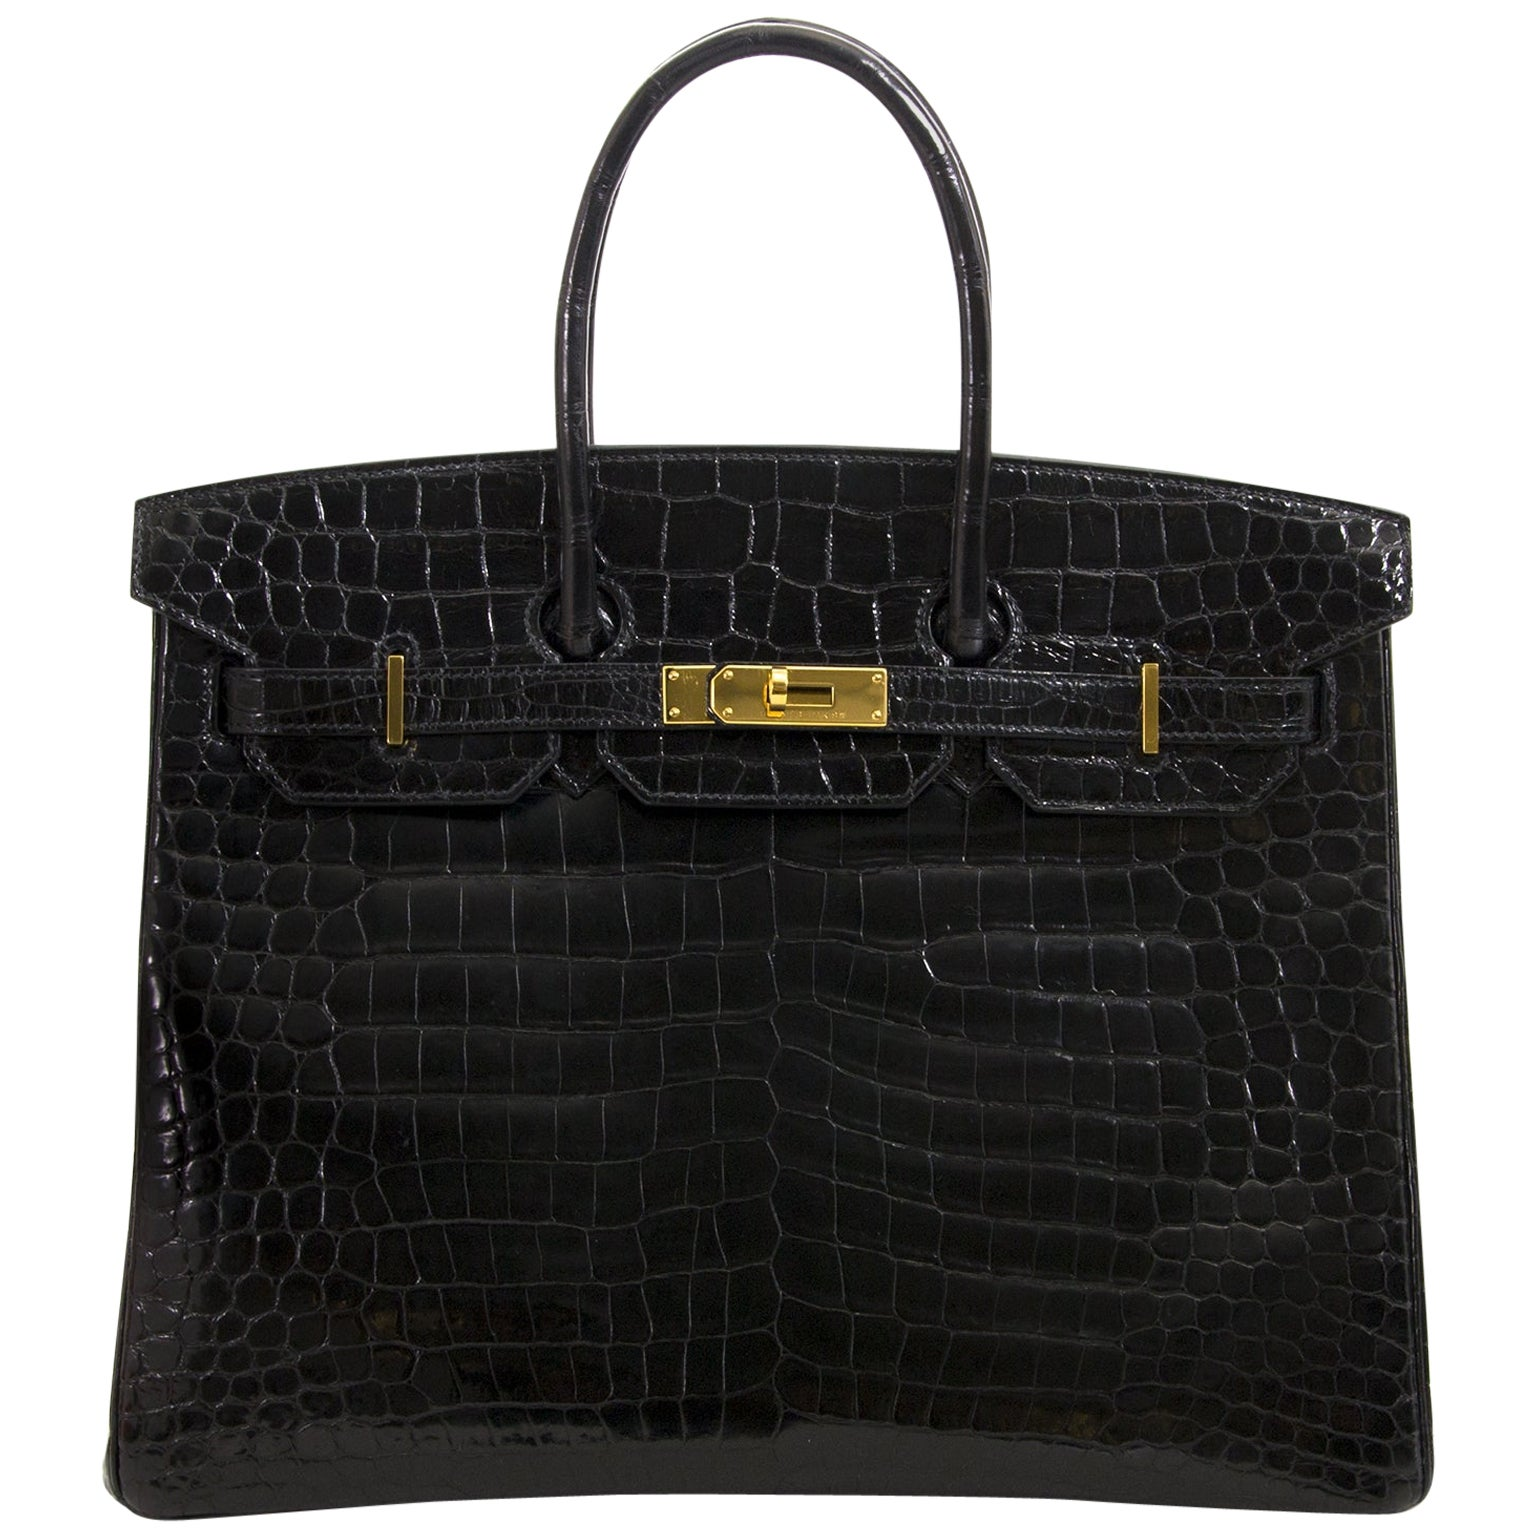 Hermès Birkin 35 Crocodile Porosus Black GHW